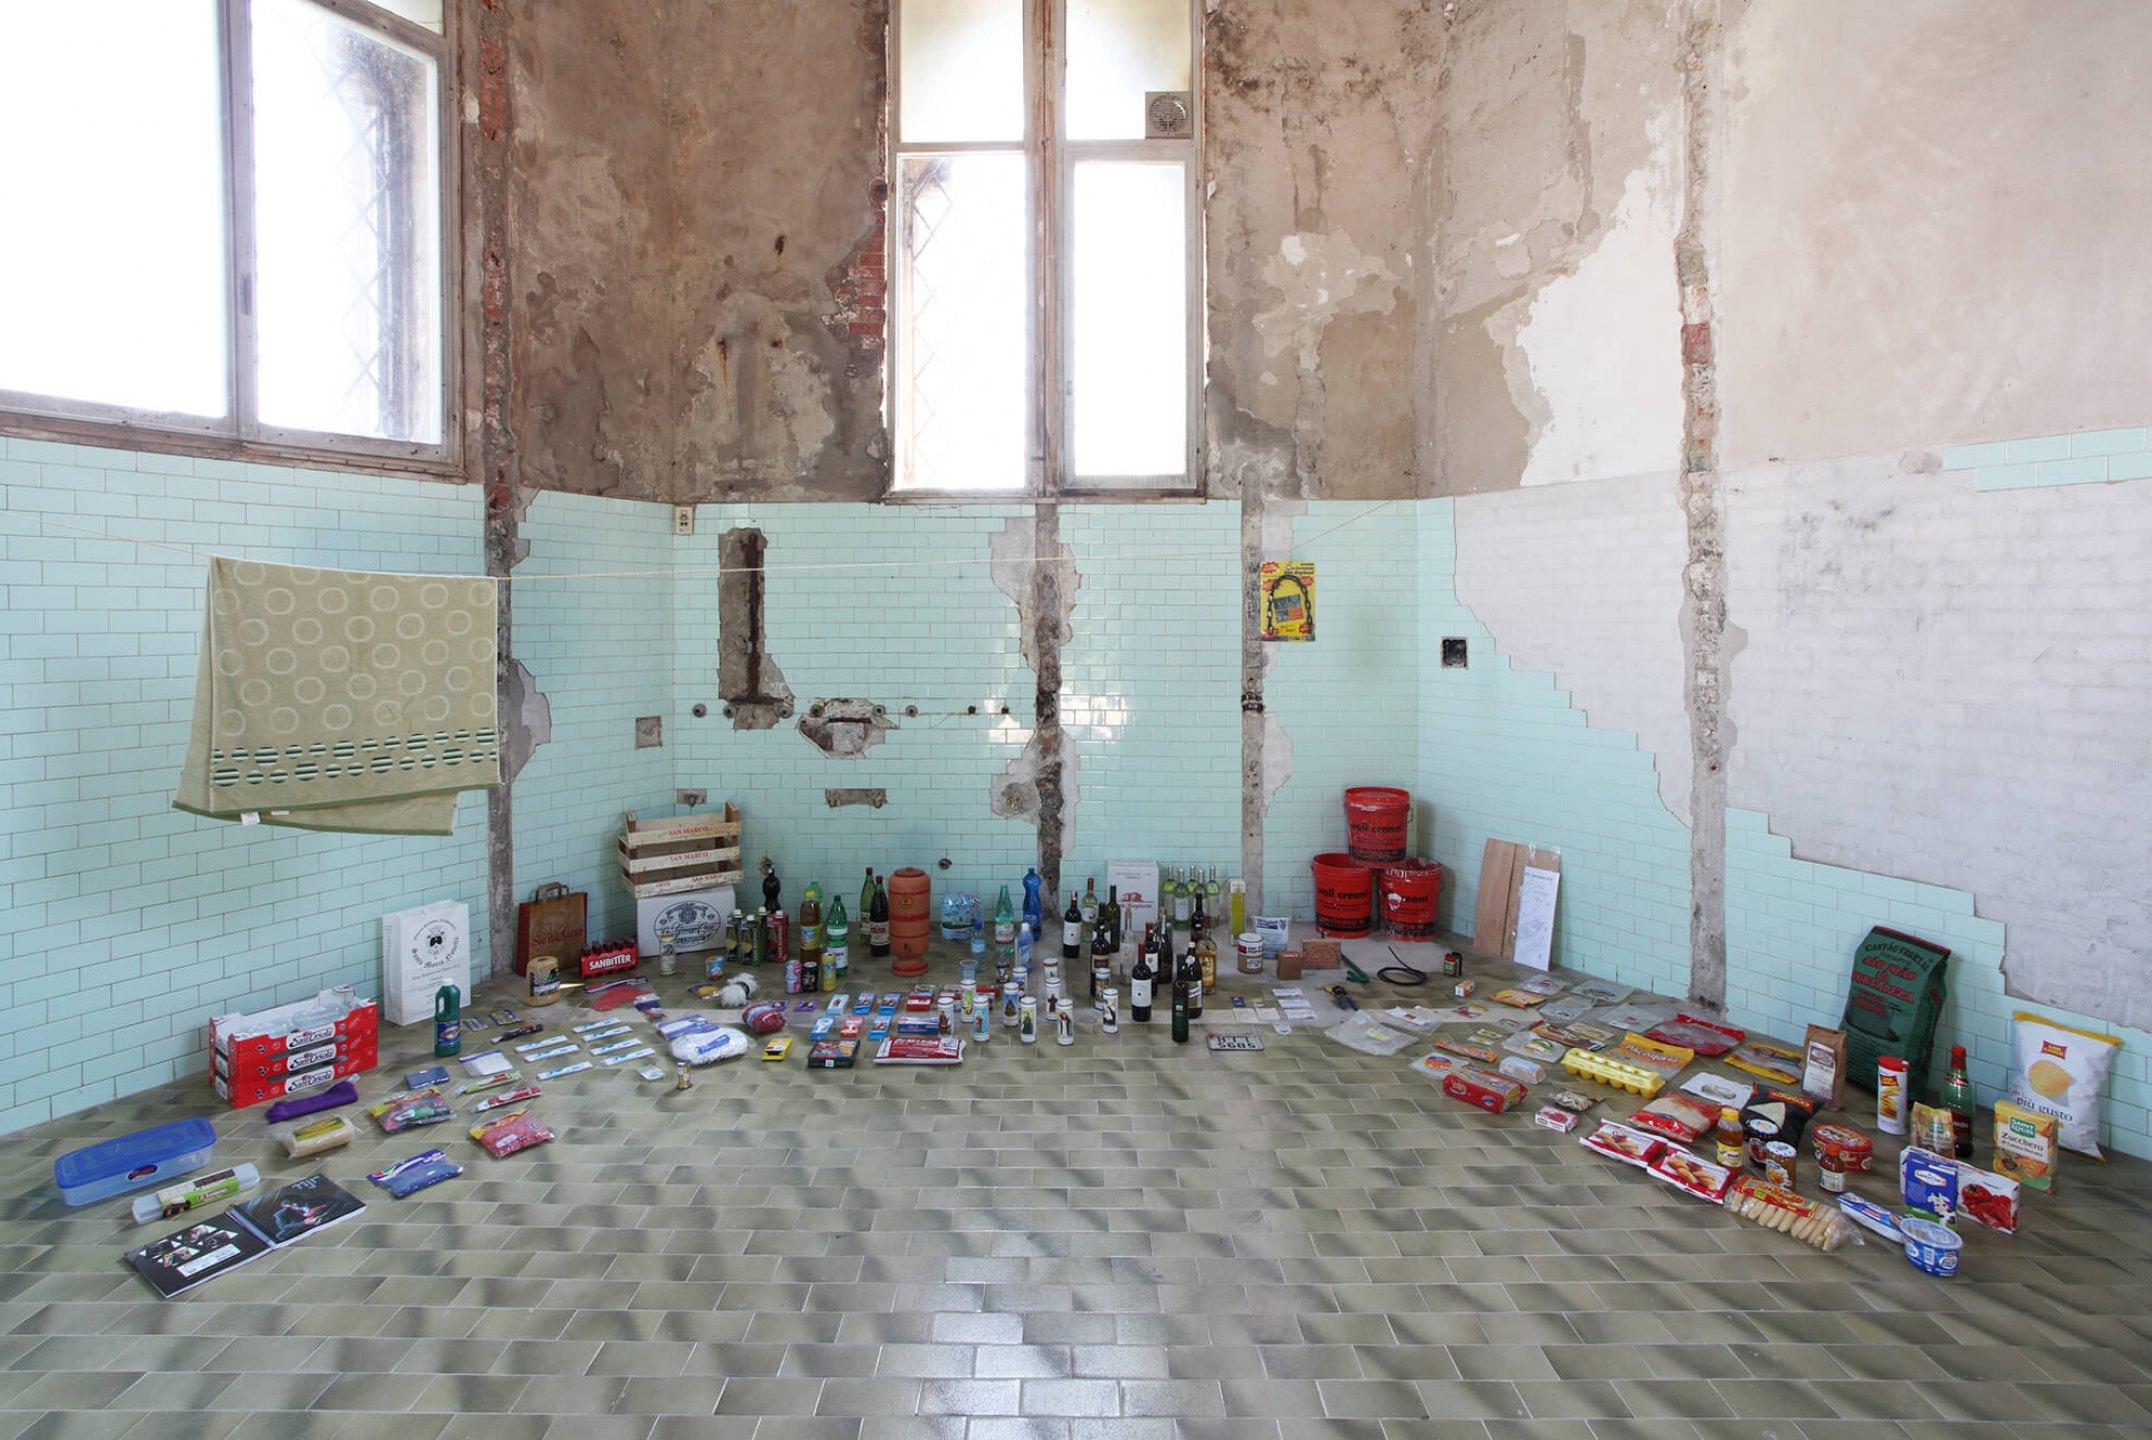 Paulo Nazareth,<em>The Encyclopedic Palace,</em> 2013, 55 Biennale di Venezia, Venice, Italy - Mendes Wood DM